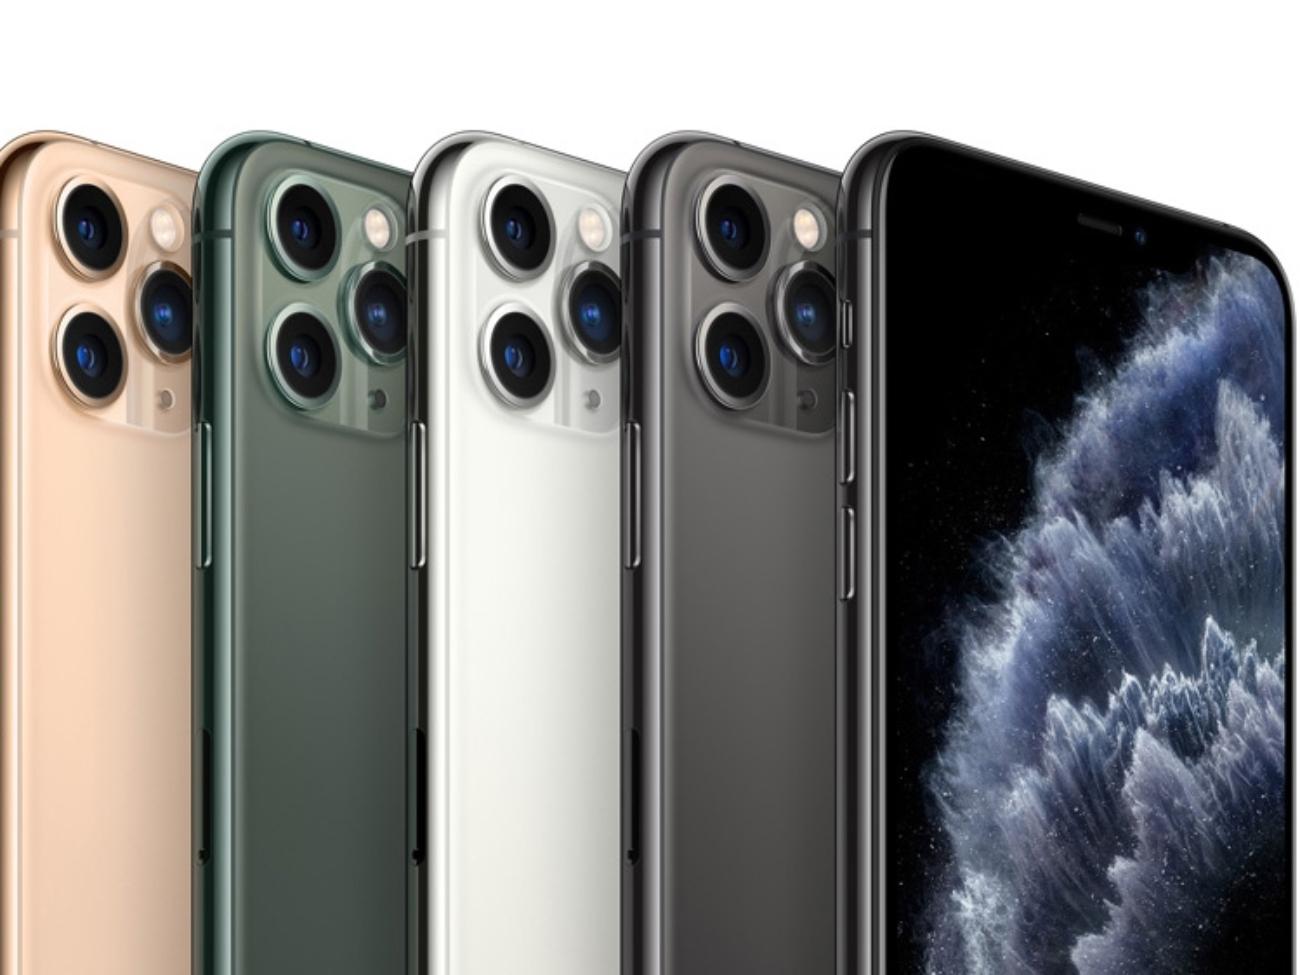 Apple-iPhone-11-Pro-Max-Gold-ct1